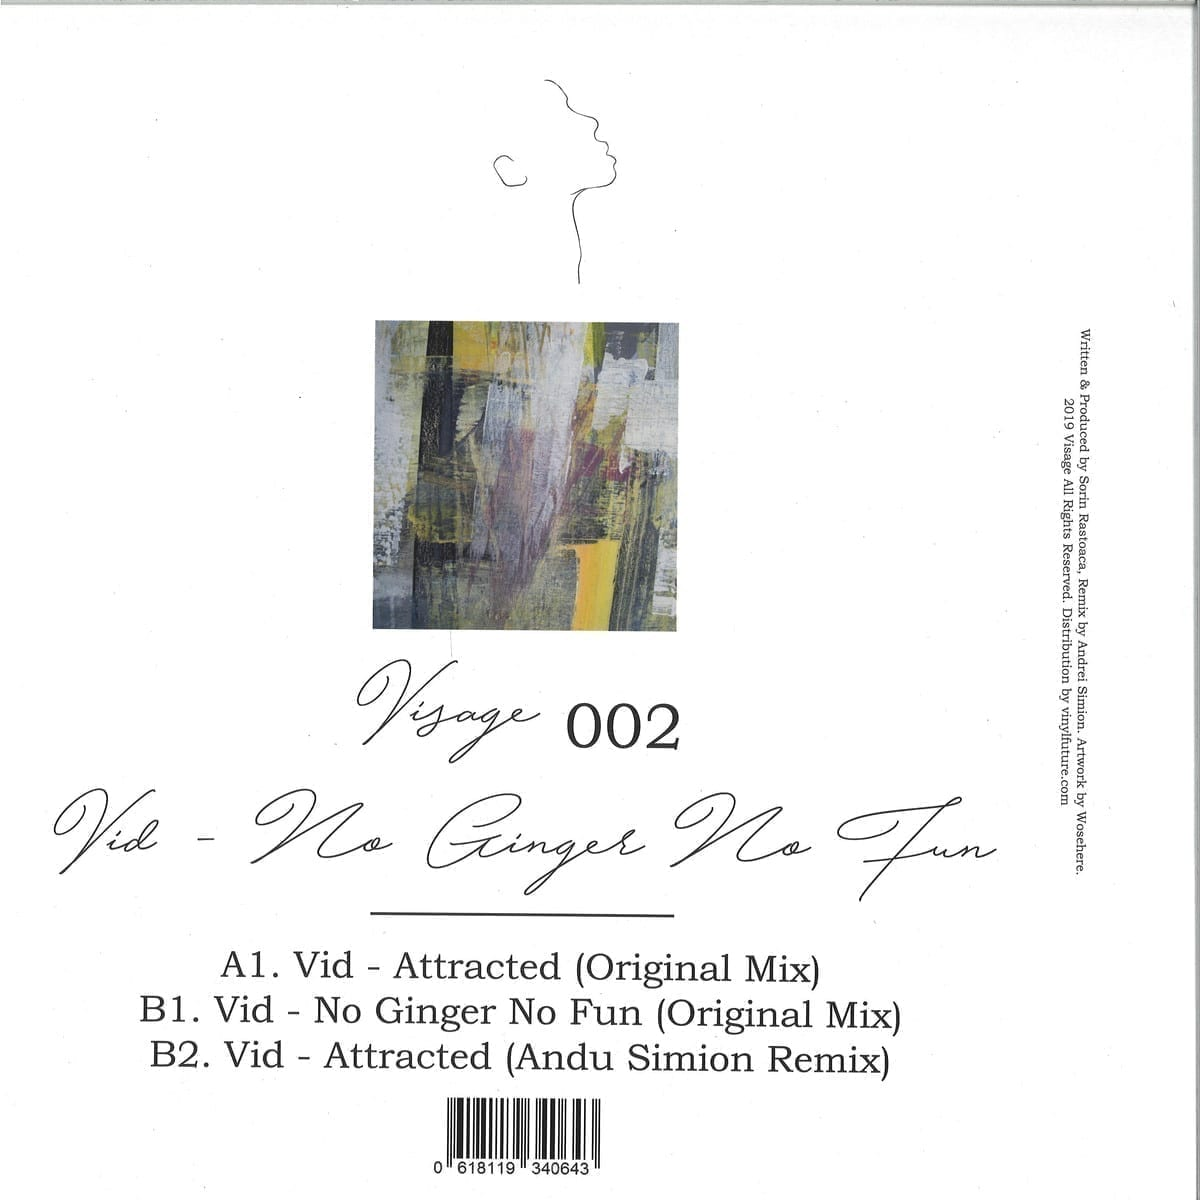 Vid - No Ginger No Fun EP [Visage LTD] back